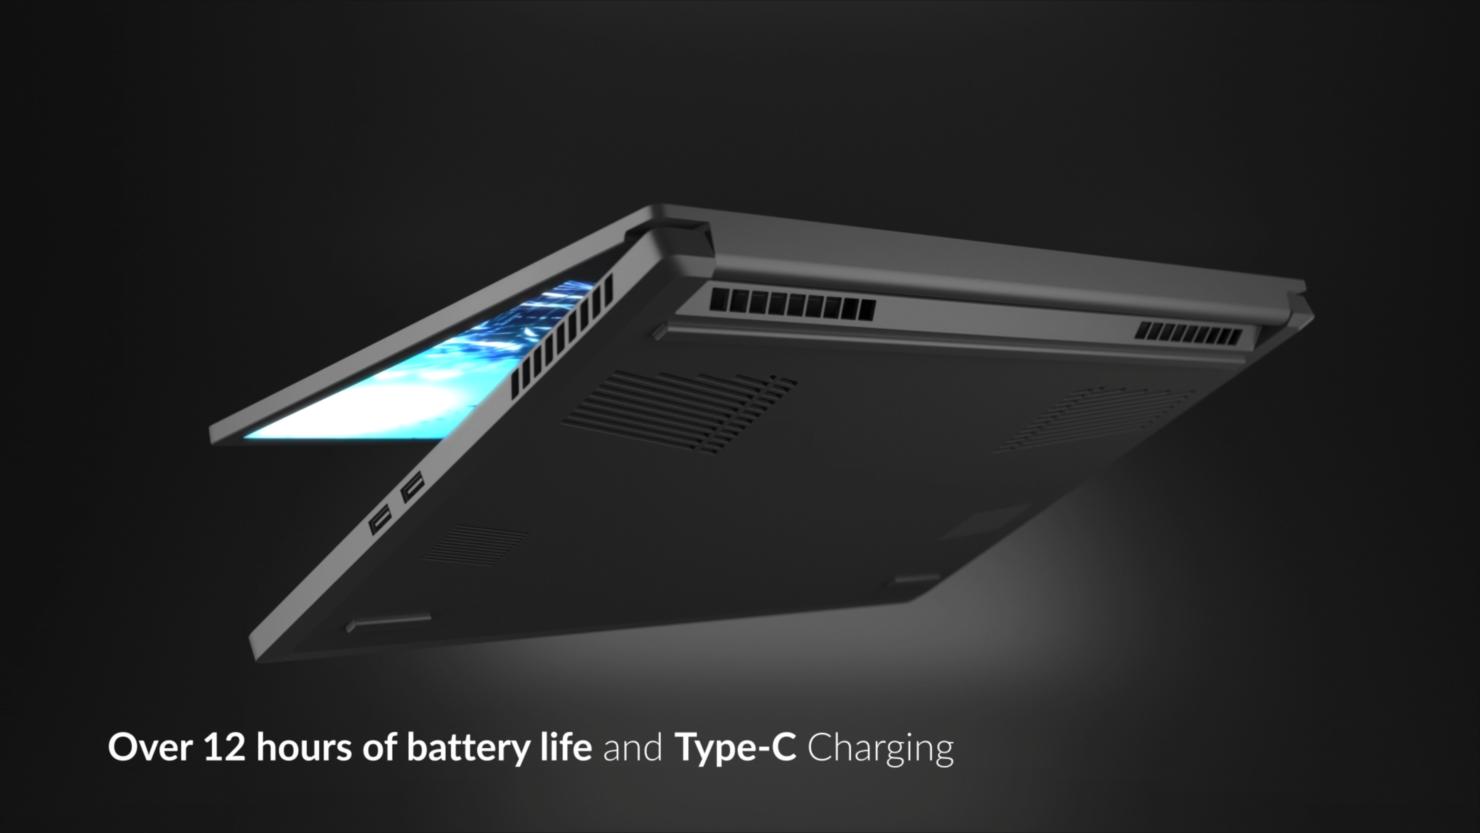 tachy-vortex-15-gaming-laptop-with-amd-ryzen-7-5800h-zen-3-cpu-nvidia-geforce-rtx-3060-6-gb-max-p-mobility-gpu-_1